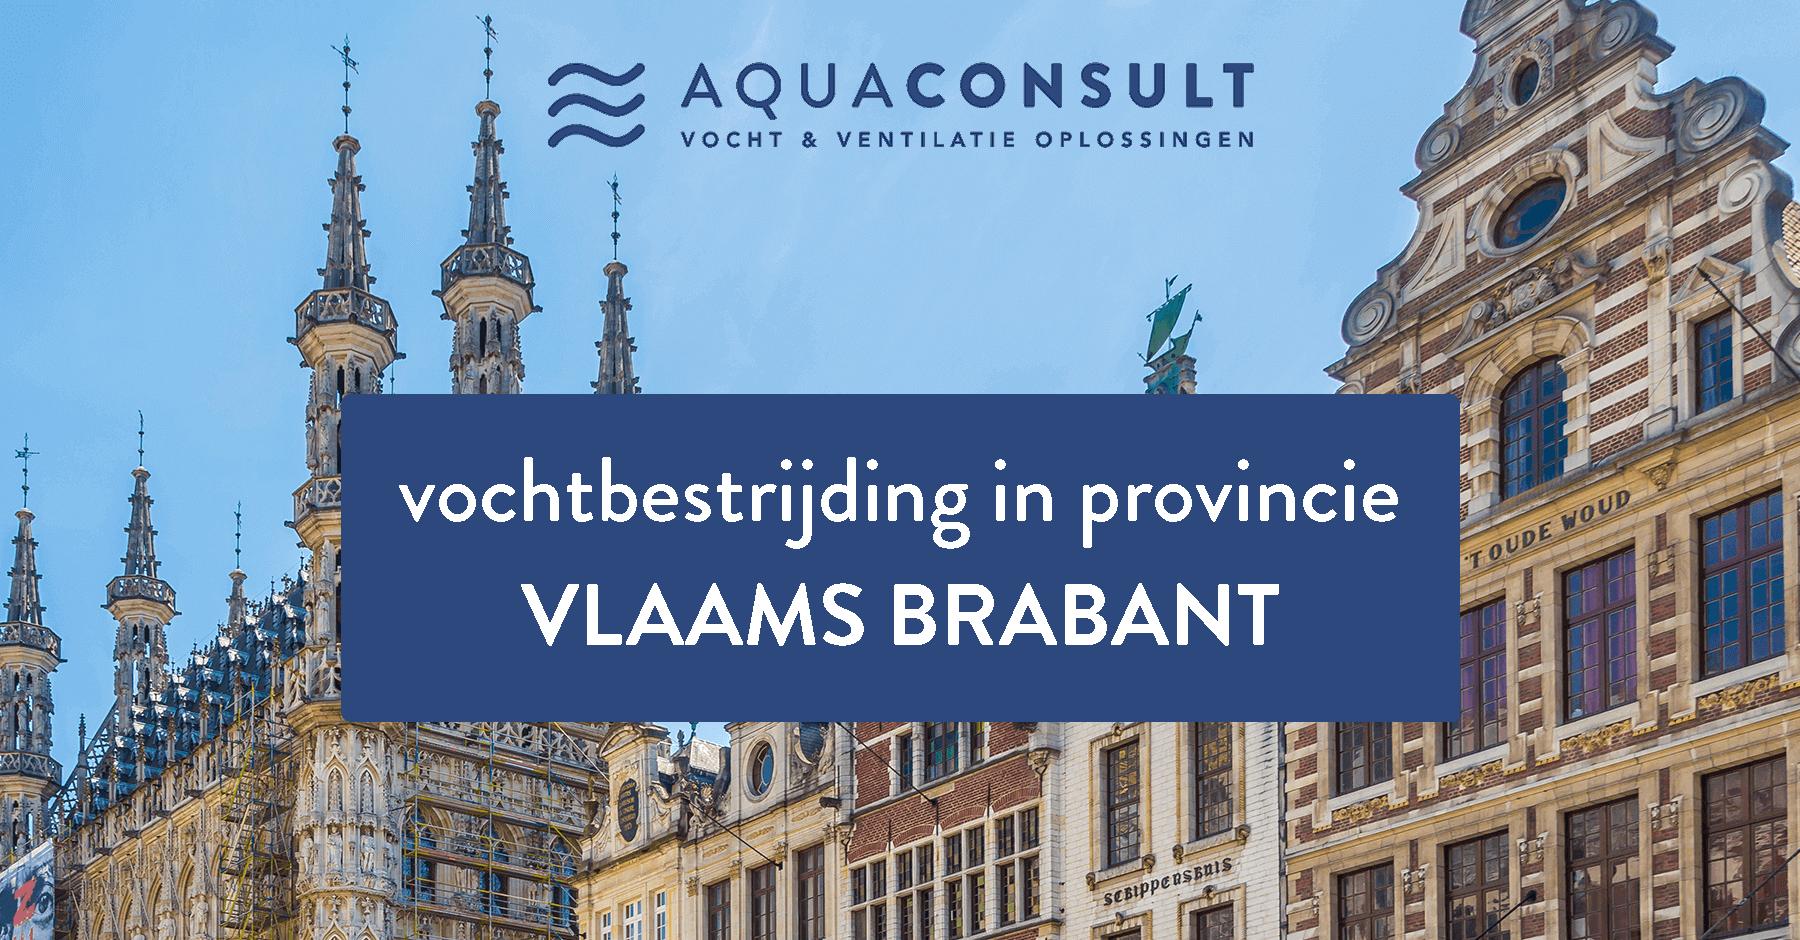 Vochtbestrijding in provincie Vlaams Brabant - Aquaconsult